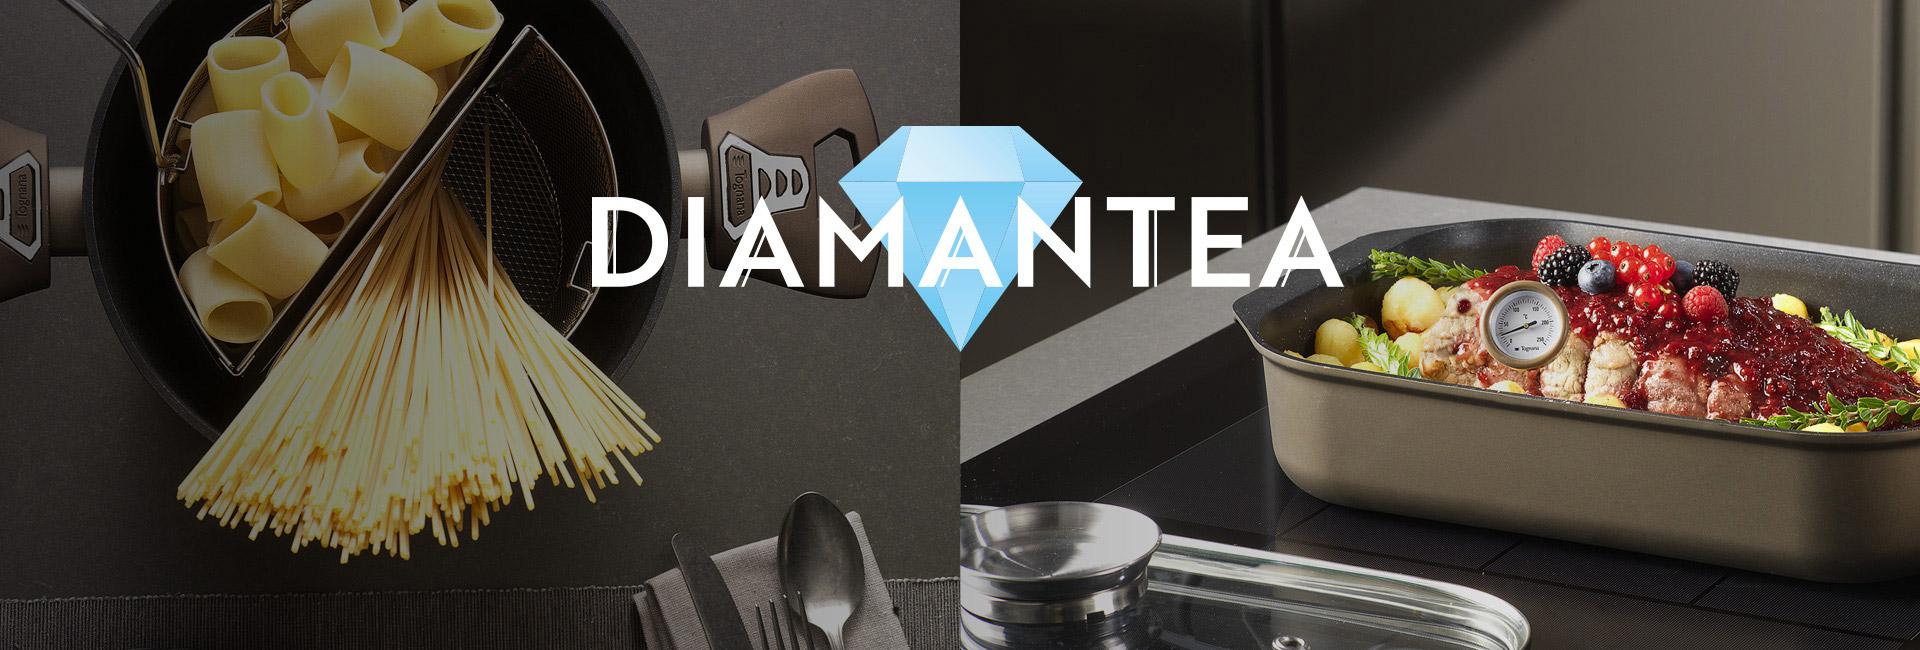 tognana-diamantea